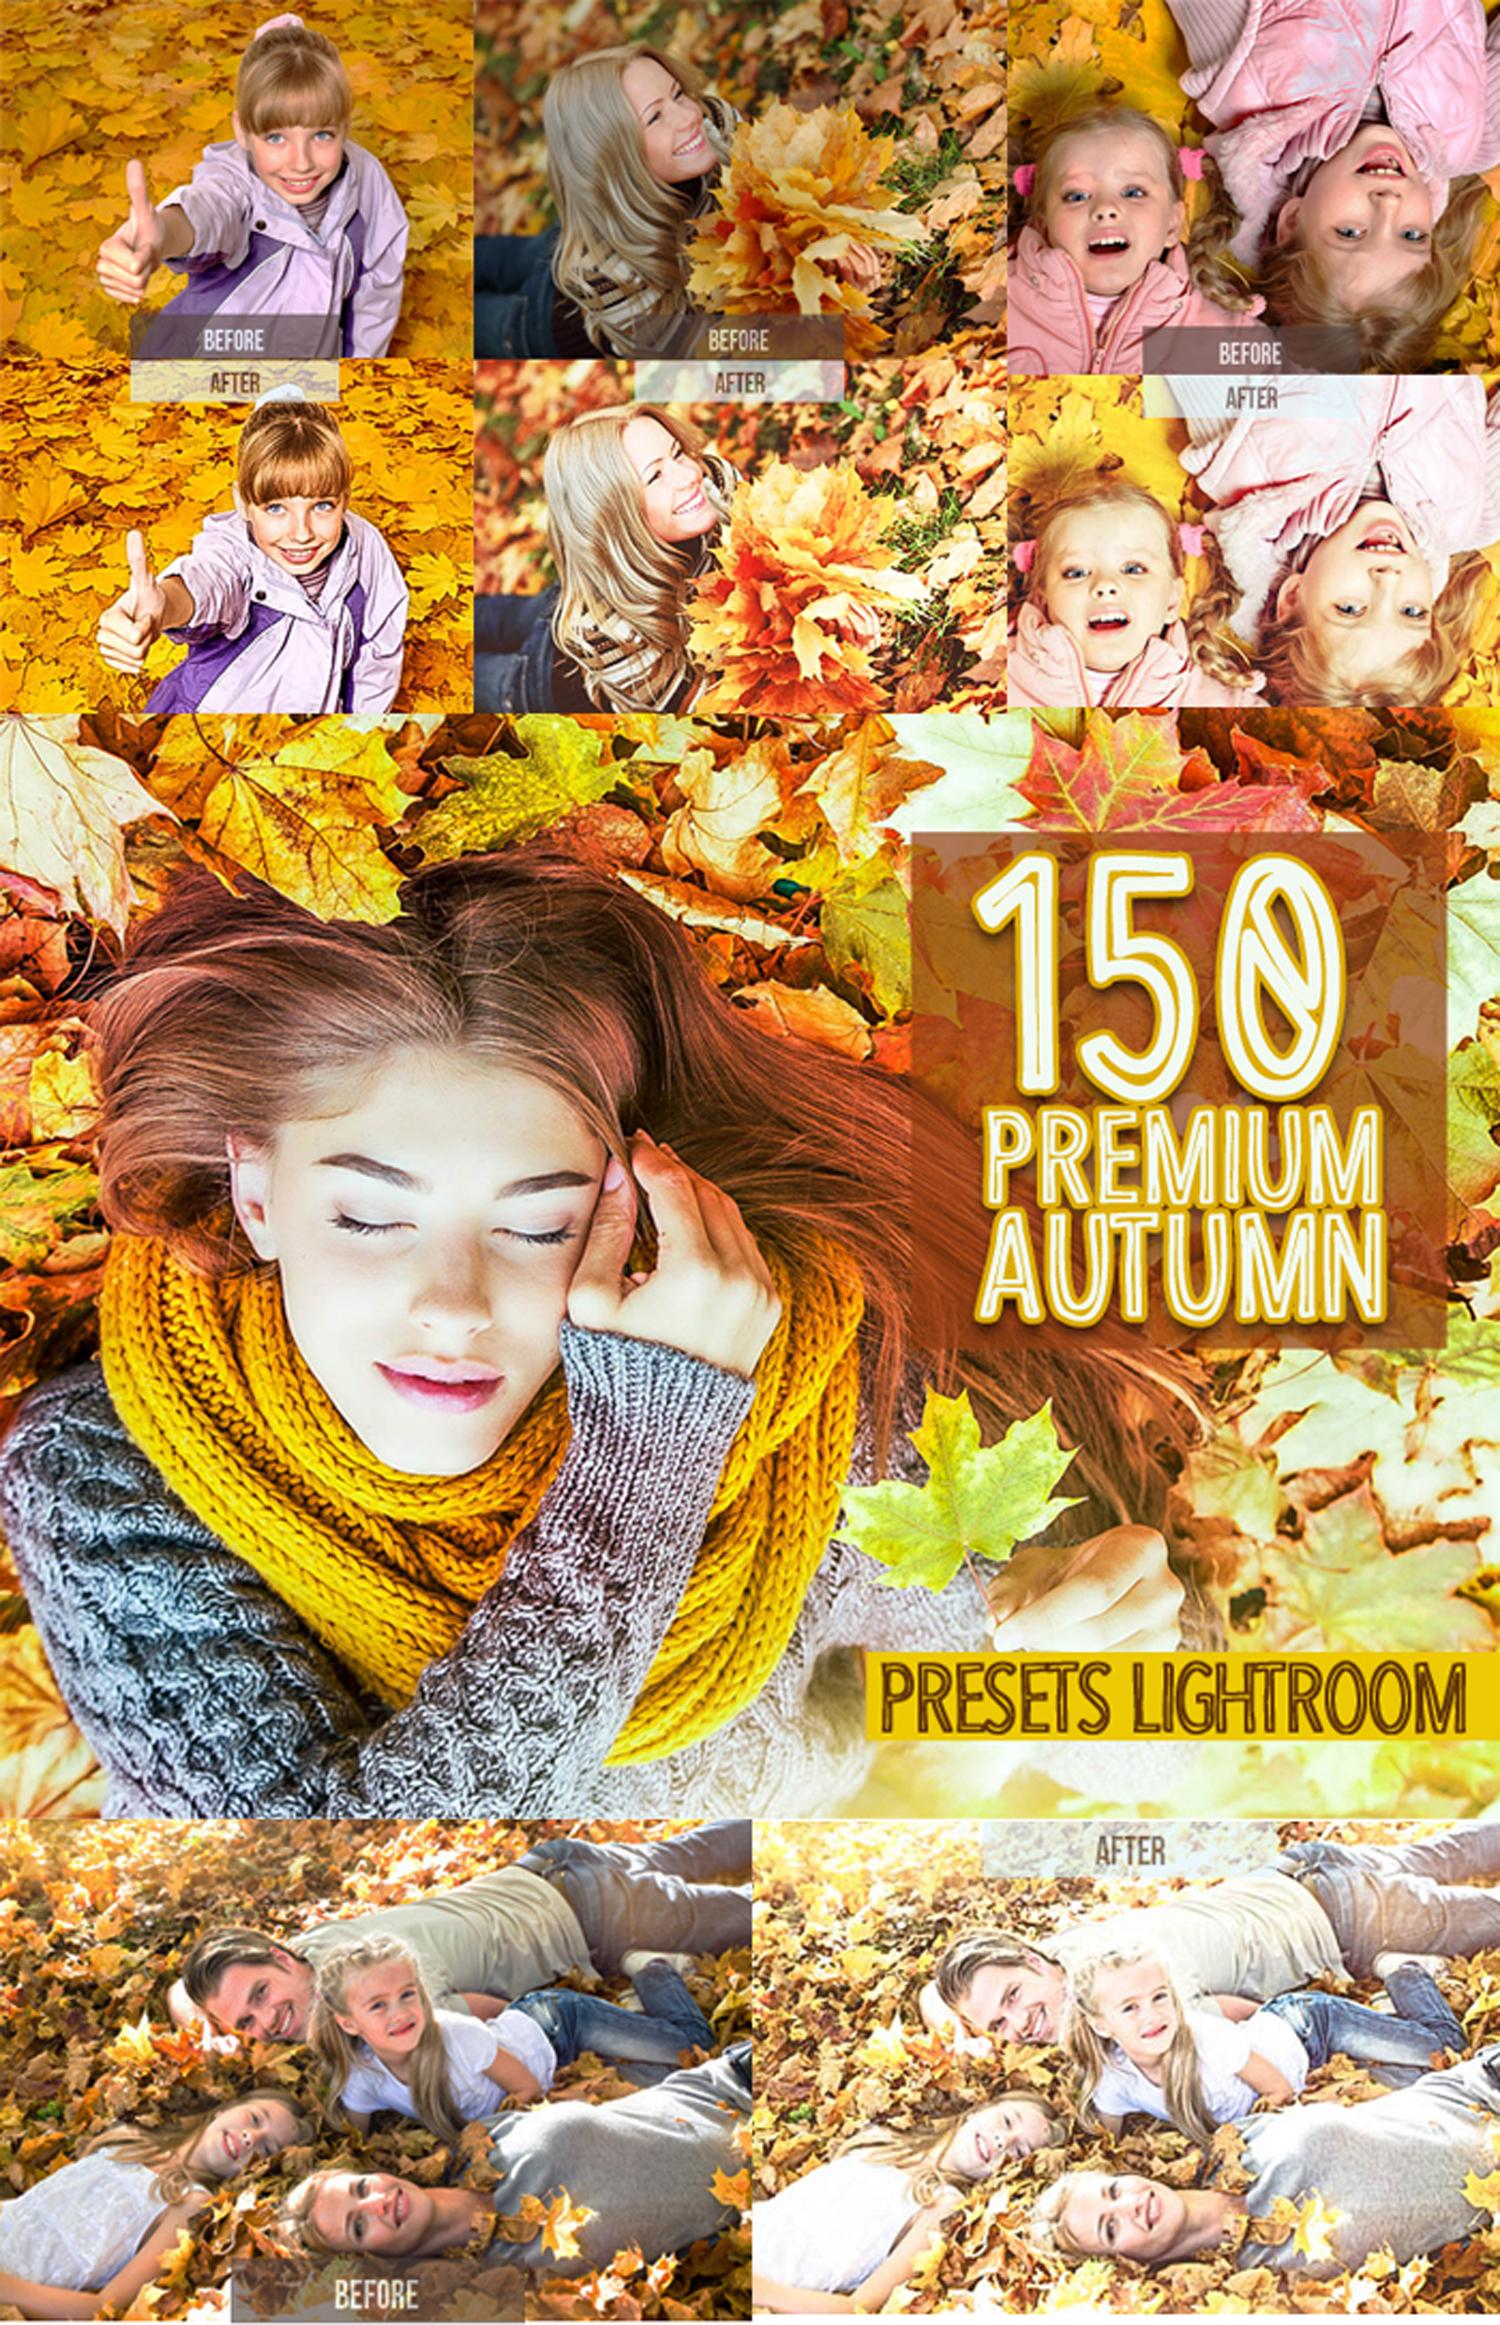 5,900+ Premium Lightroom Presets example image 4